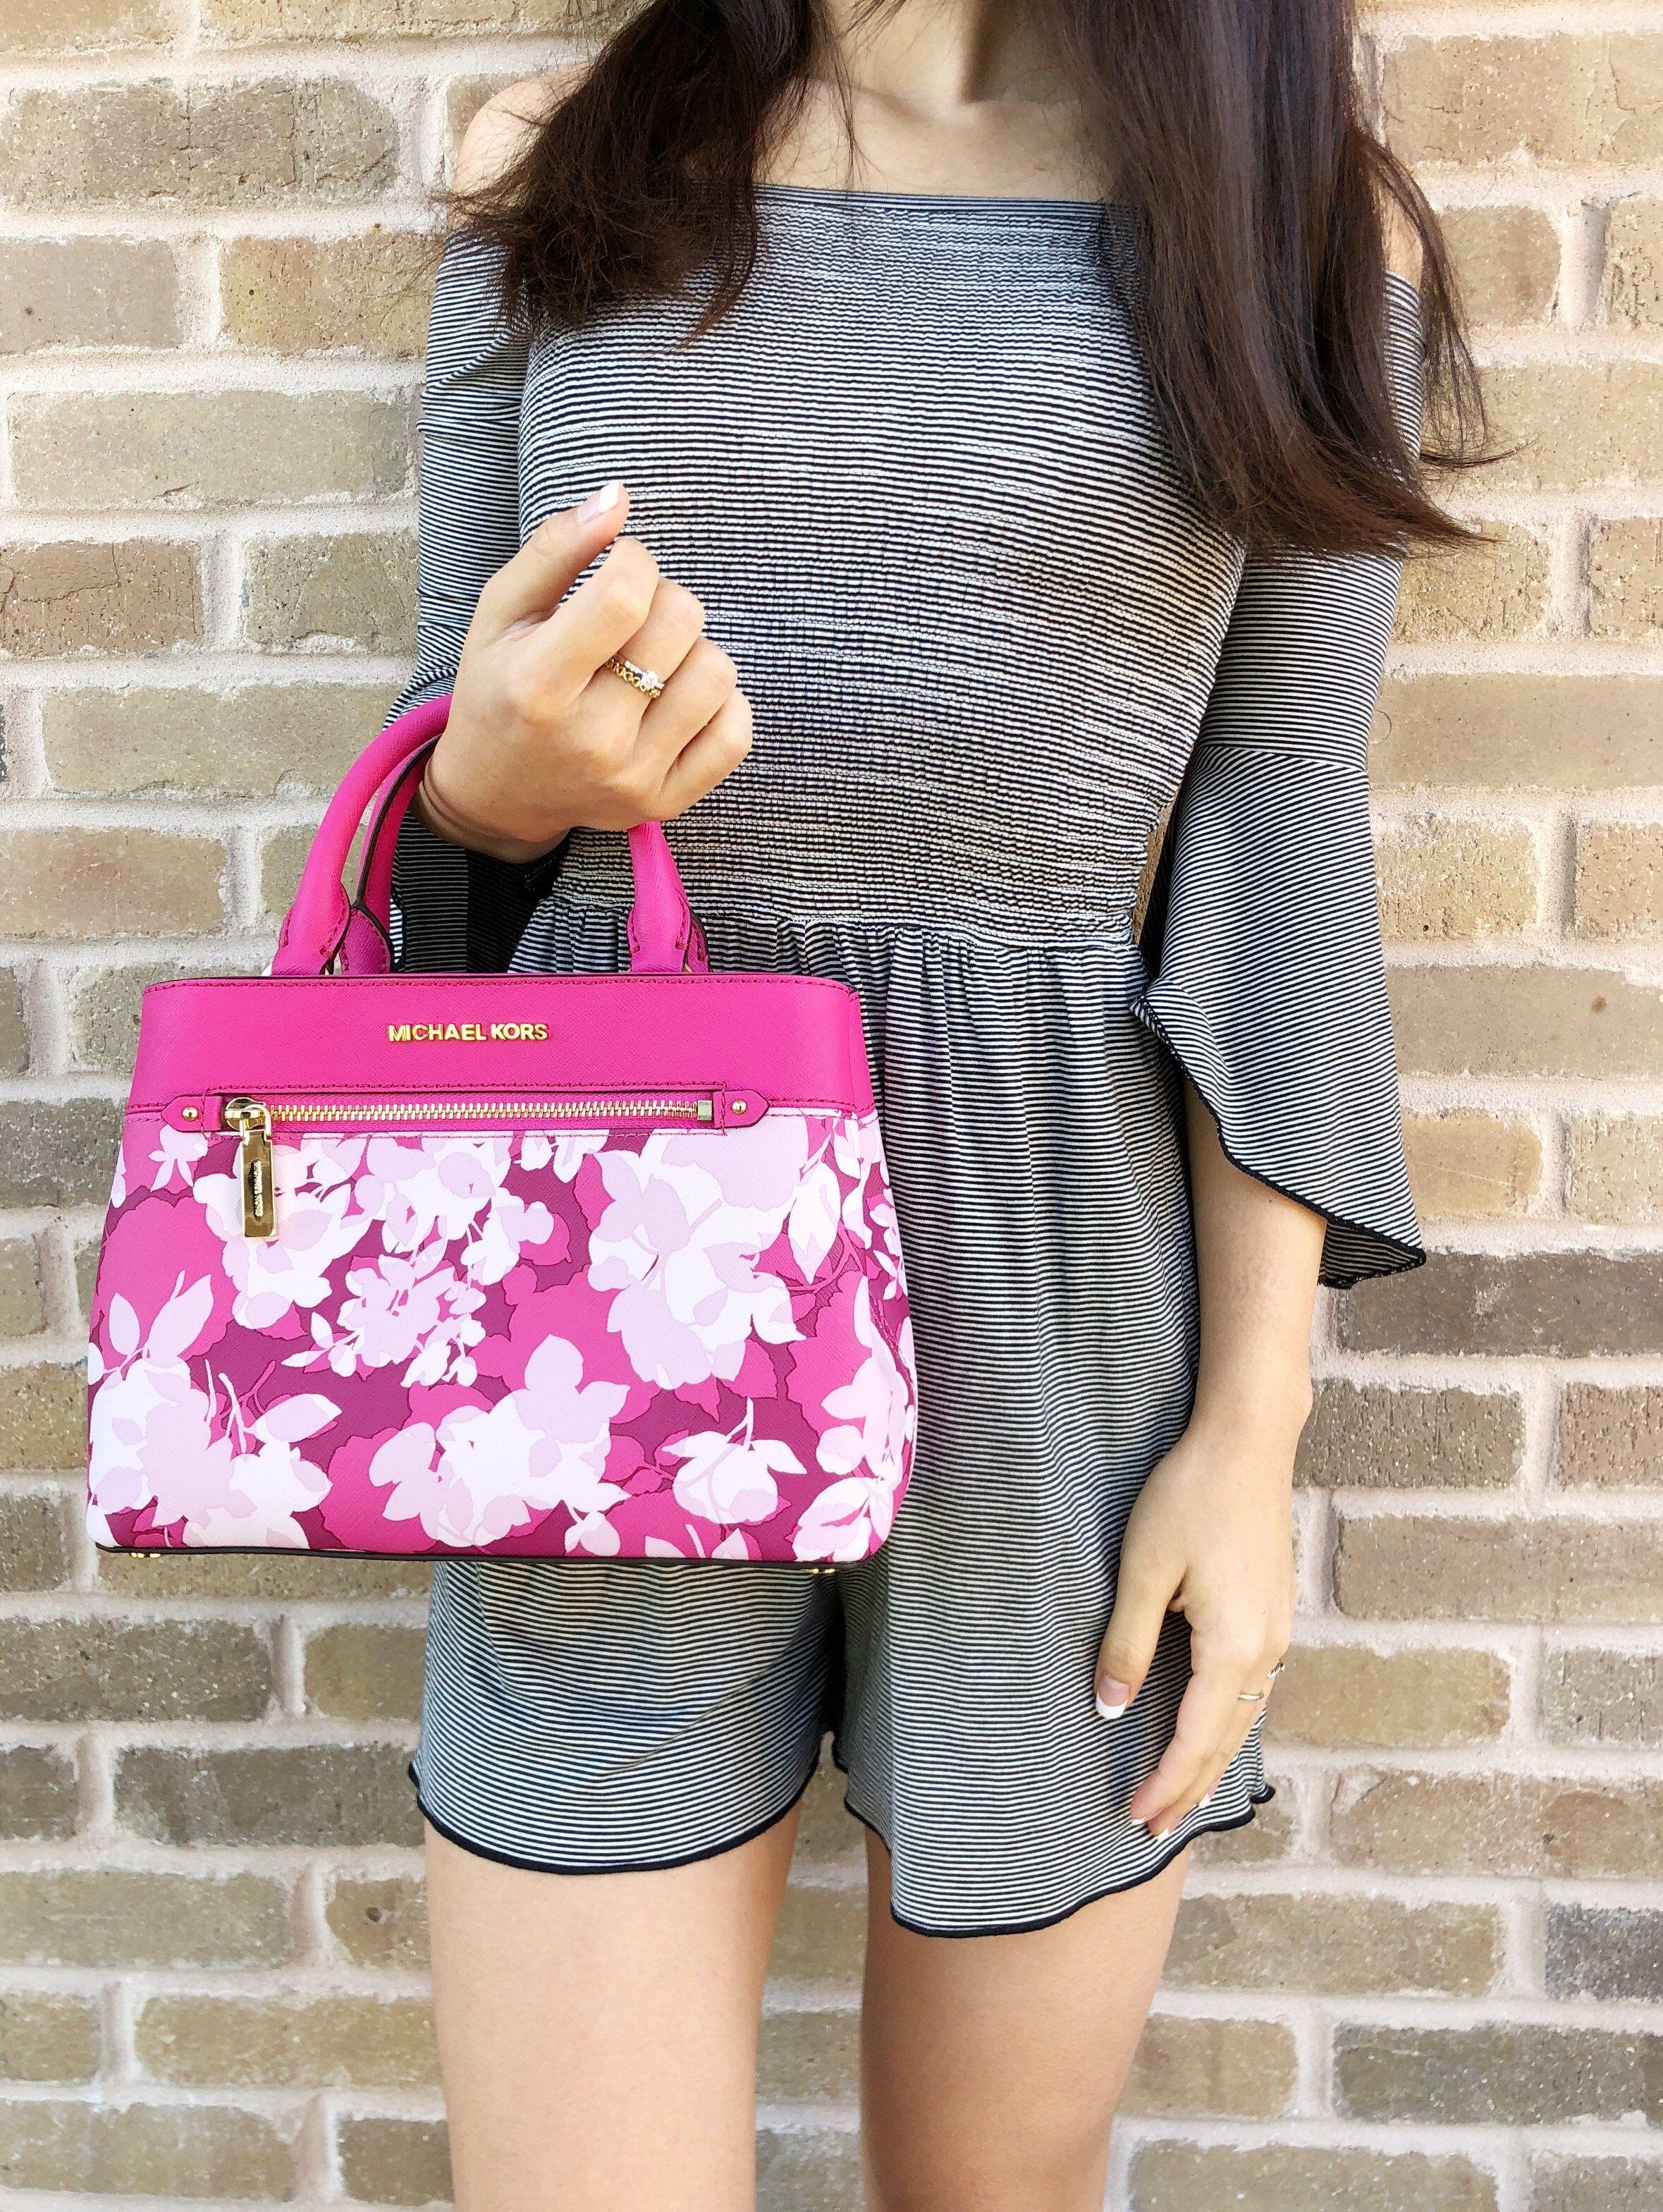 6ffbb8be62f7 Michael Kors Hailee Kellen XS Satchel Small Crossbody Granita Pink White  Floral #ebayfashion #ebaystore #posh #ebayresellers #poshmarkpackages  #mercaricode ...